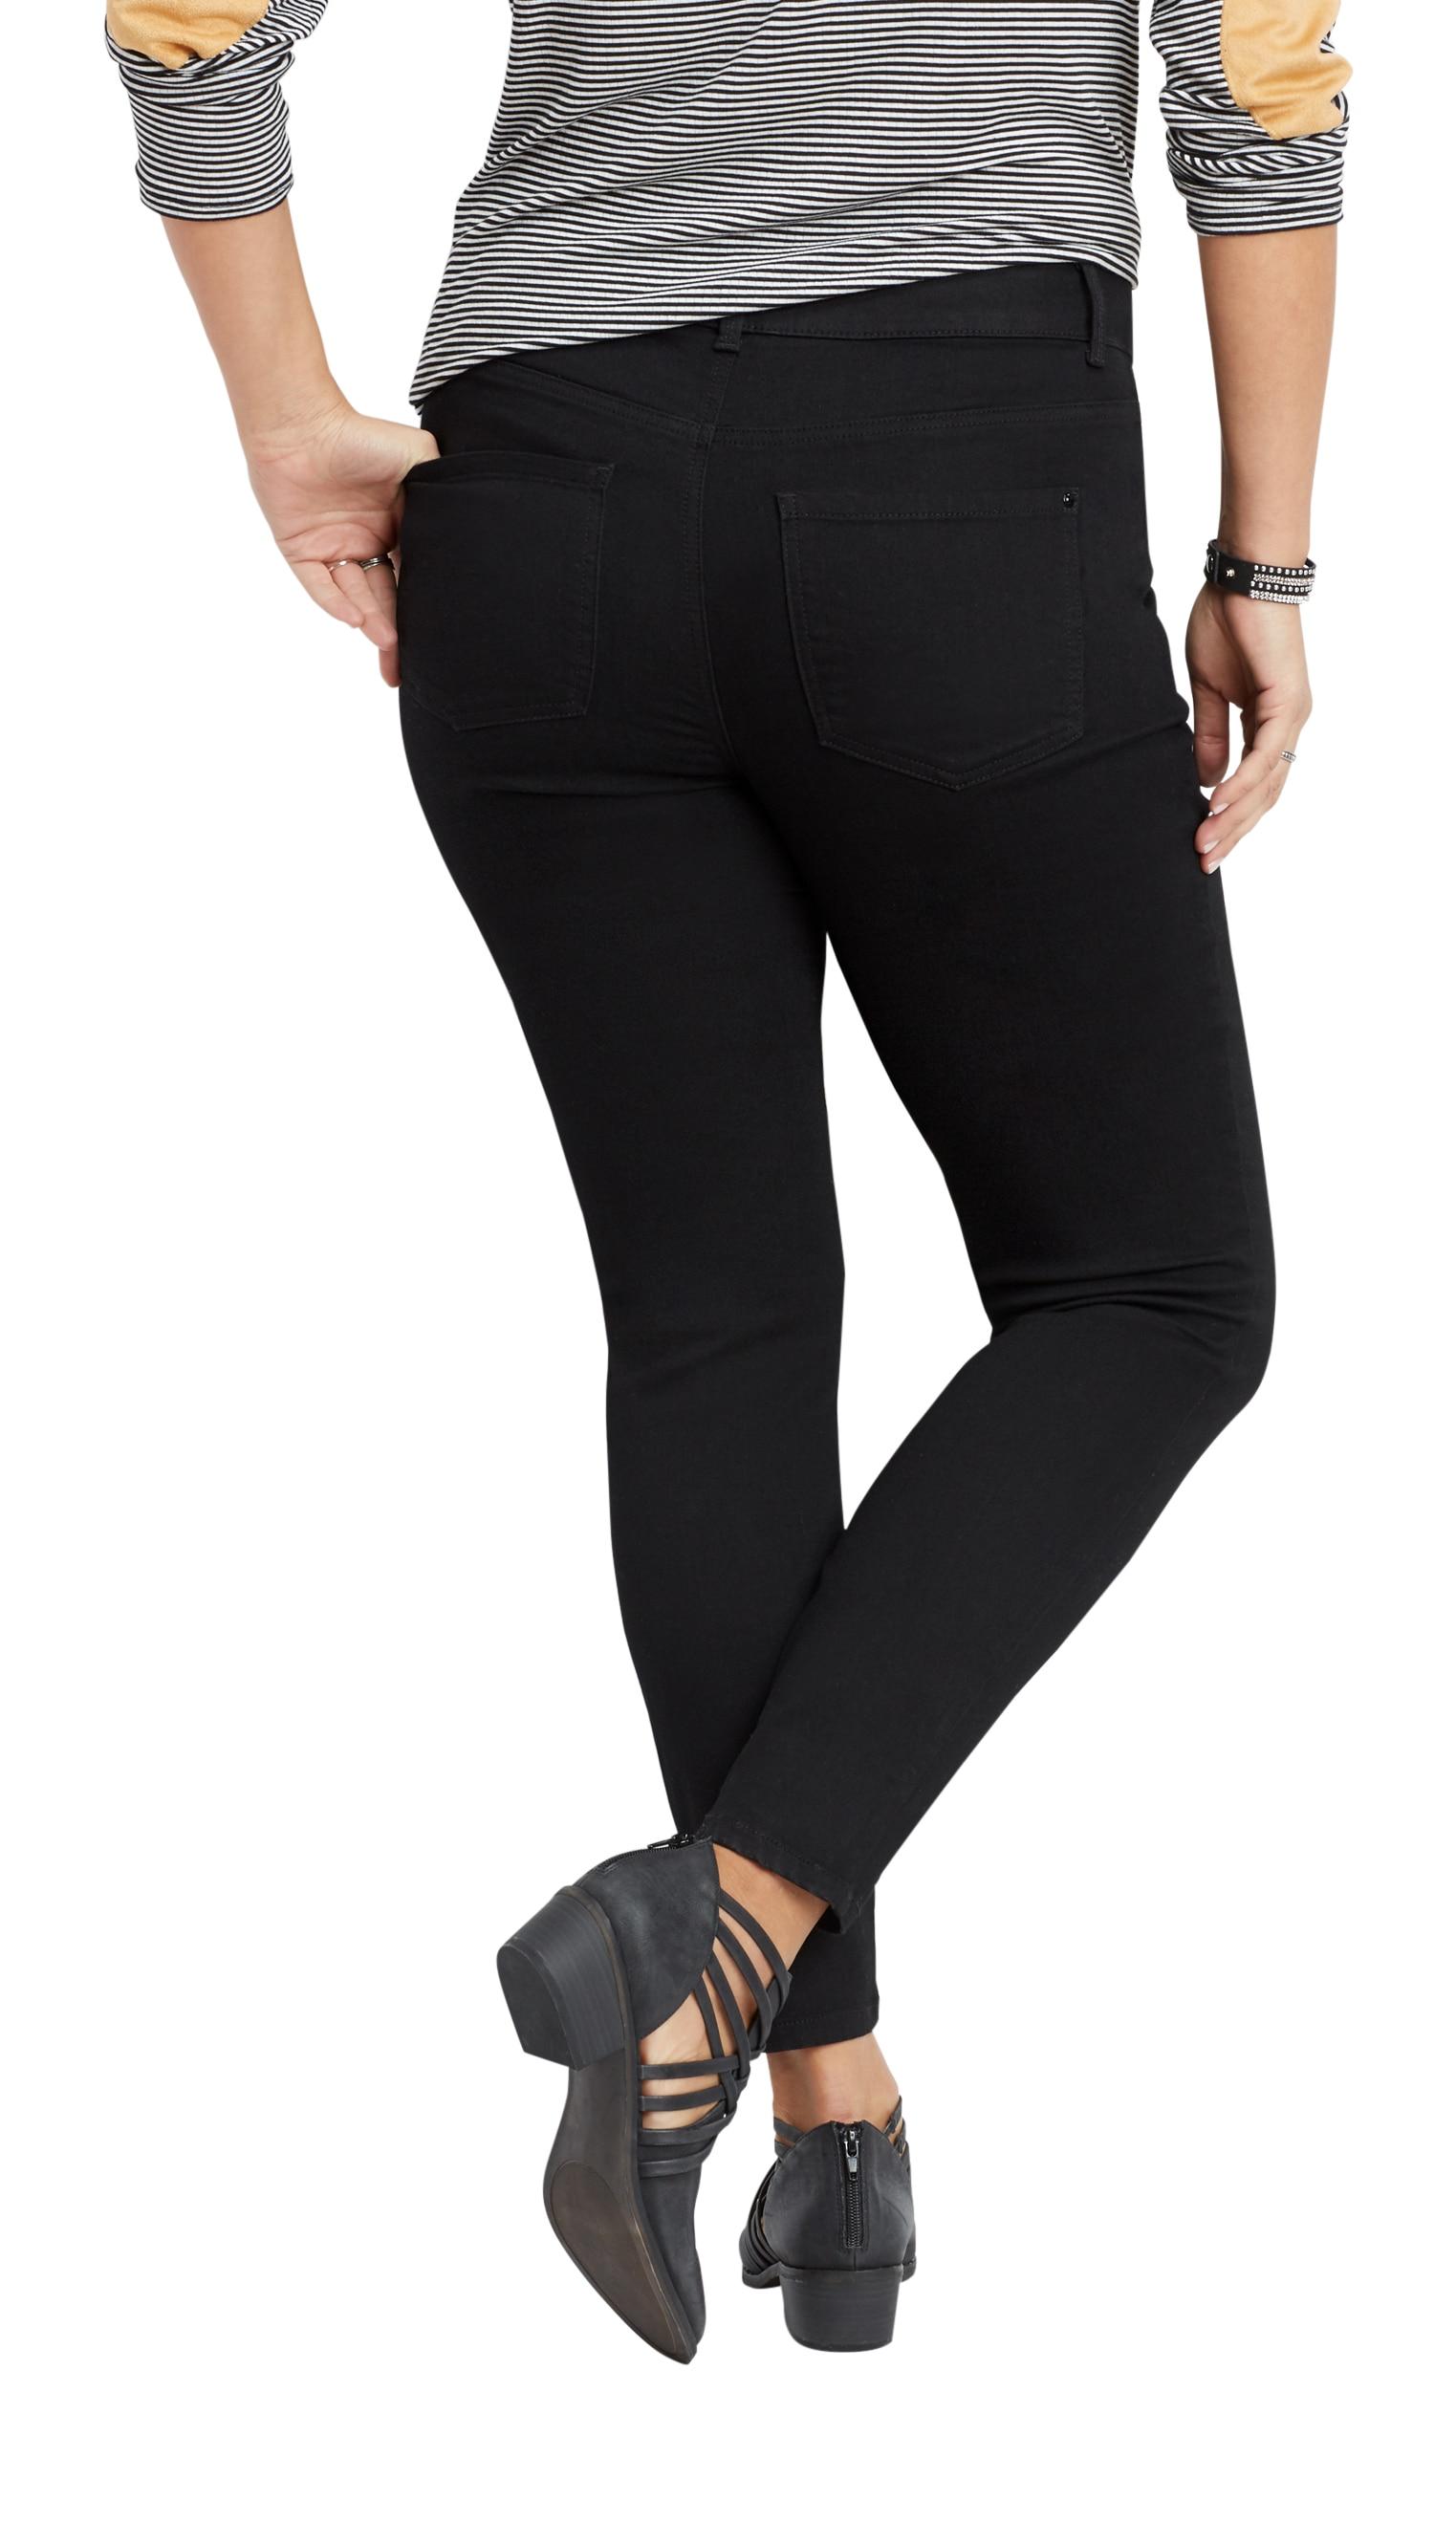 4df737ca77b maurices - Maurices Women s Everflex Skinny Jeans - Plus Size Dark Rinse  High Rise - Walmart.com